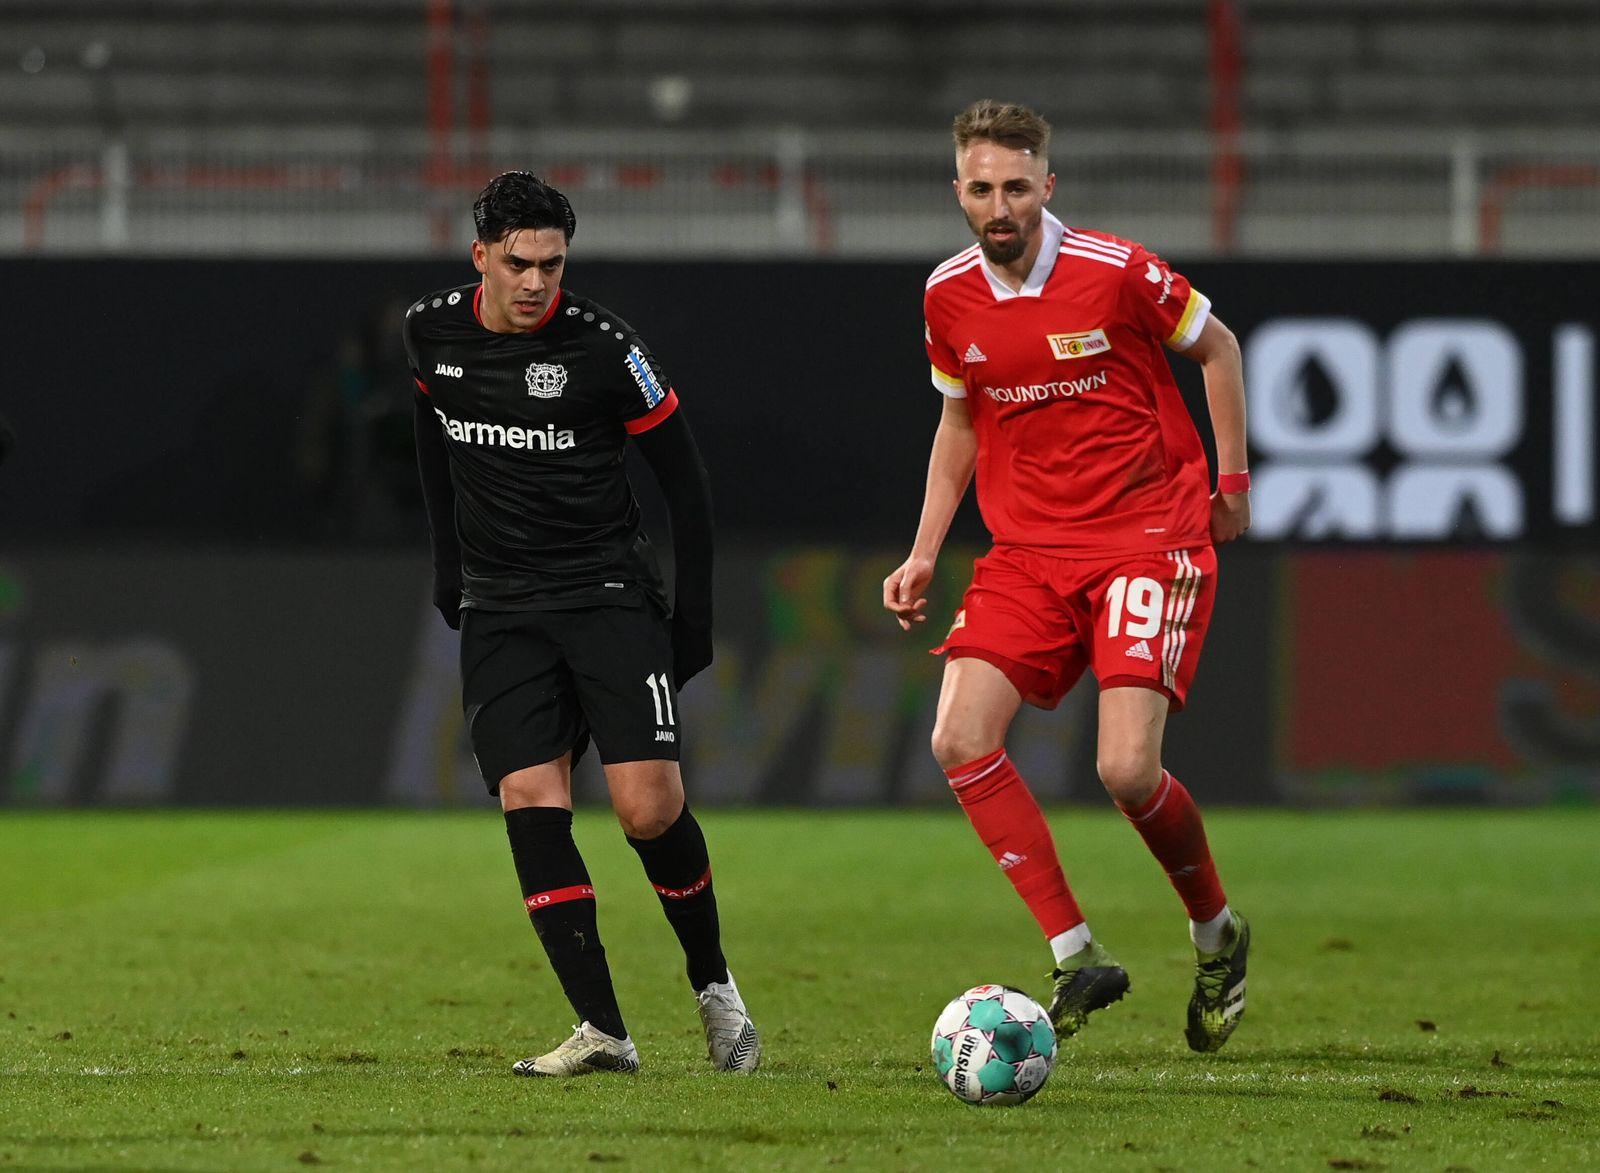 Fussball, Herren, Saison 2020/2021, 1. Bundesliga (16. Spieltag), 1. FC Union Berlin - Bayer Leverkusen (1:0), v. l. Na